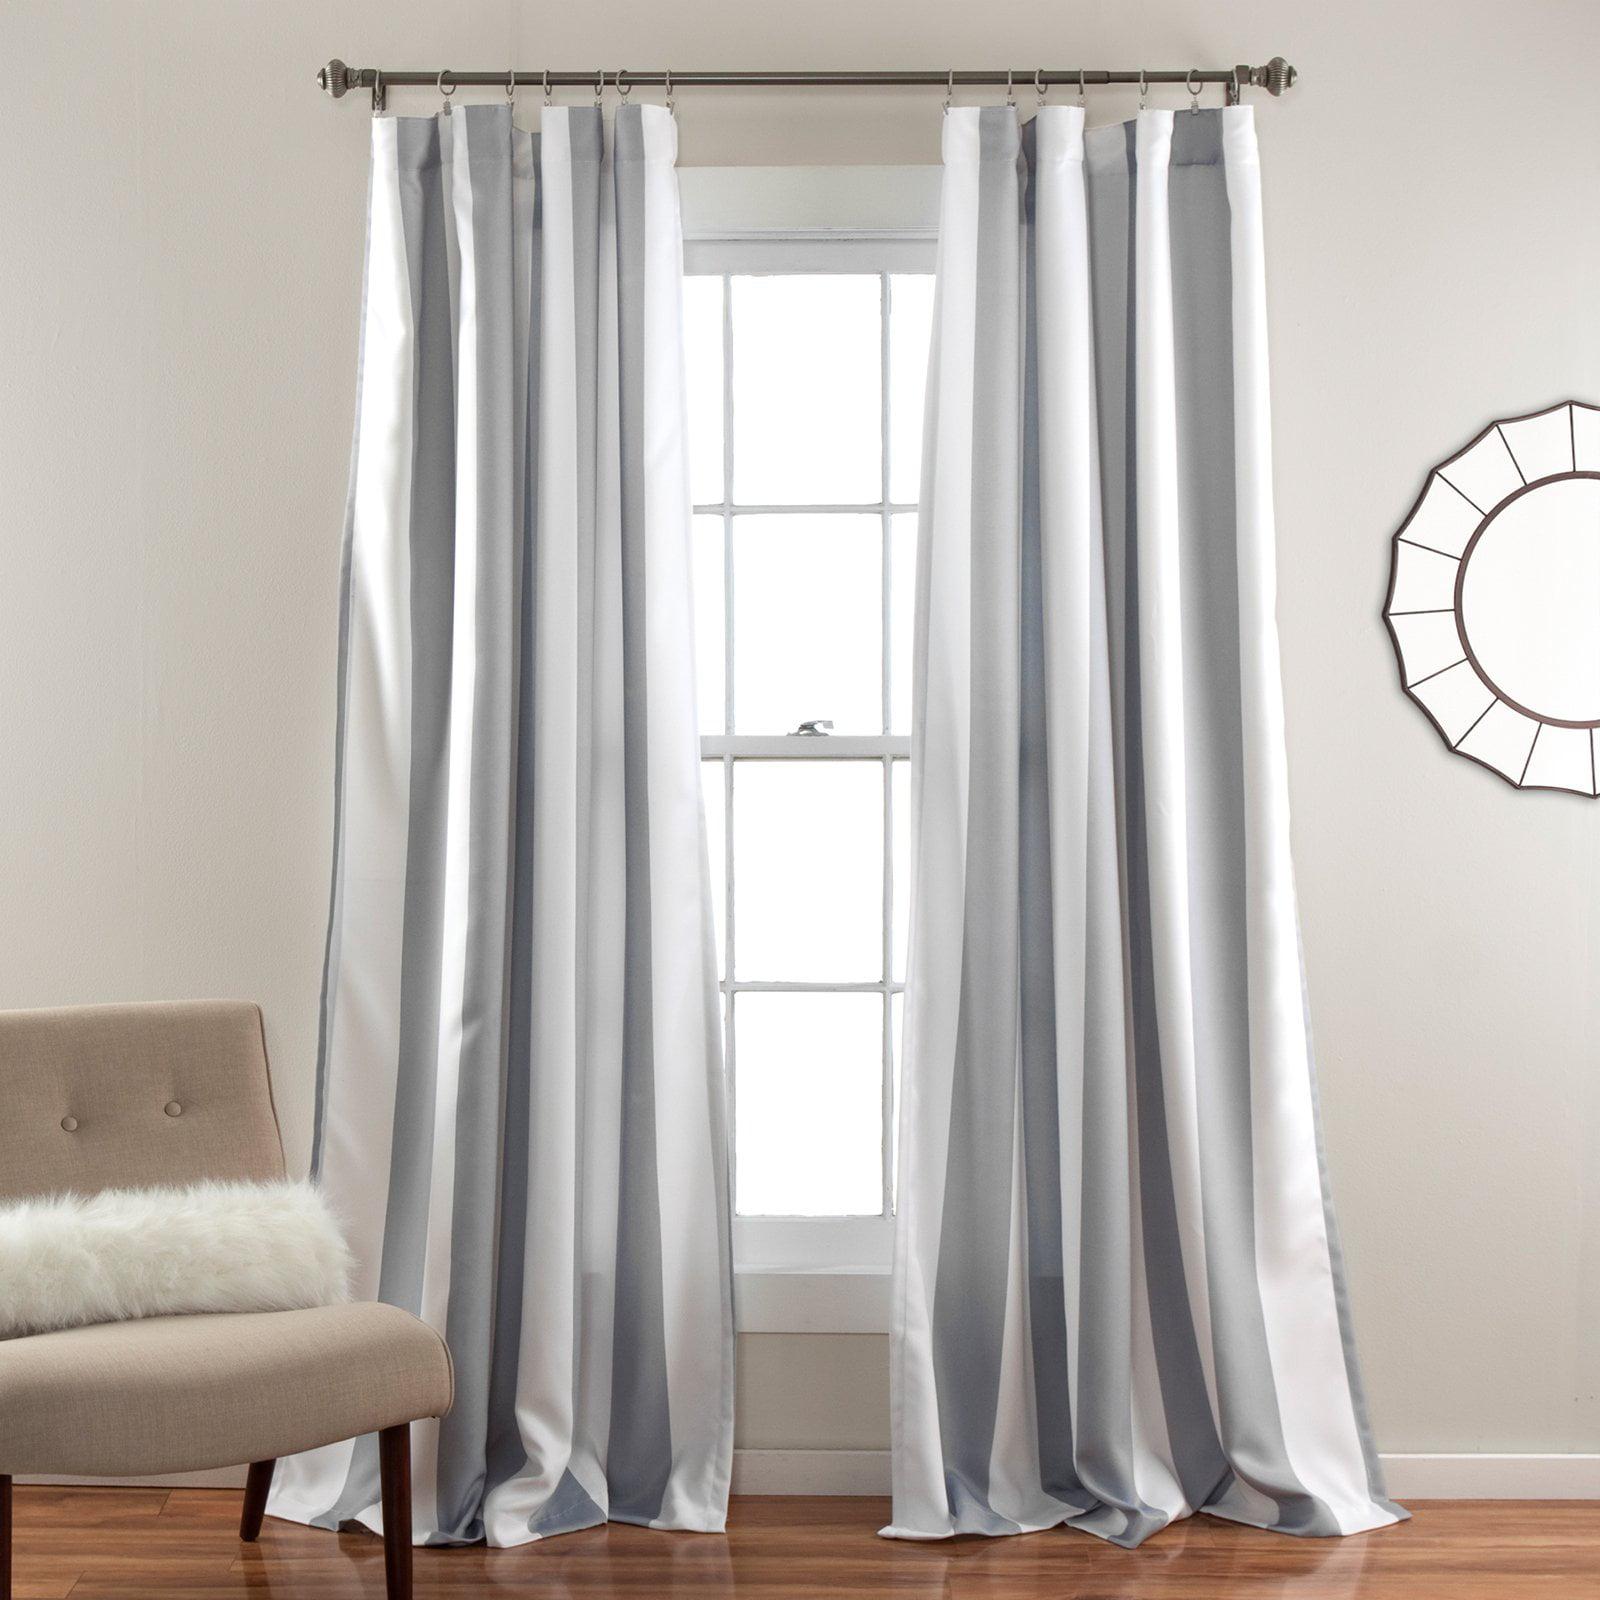 Wilbur Window Curtain Set - Walmart.com